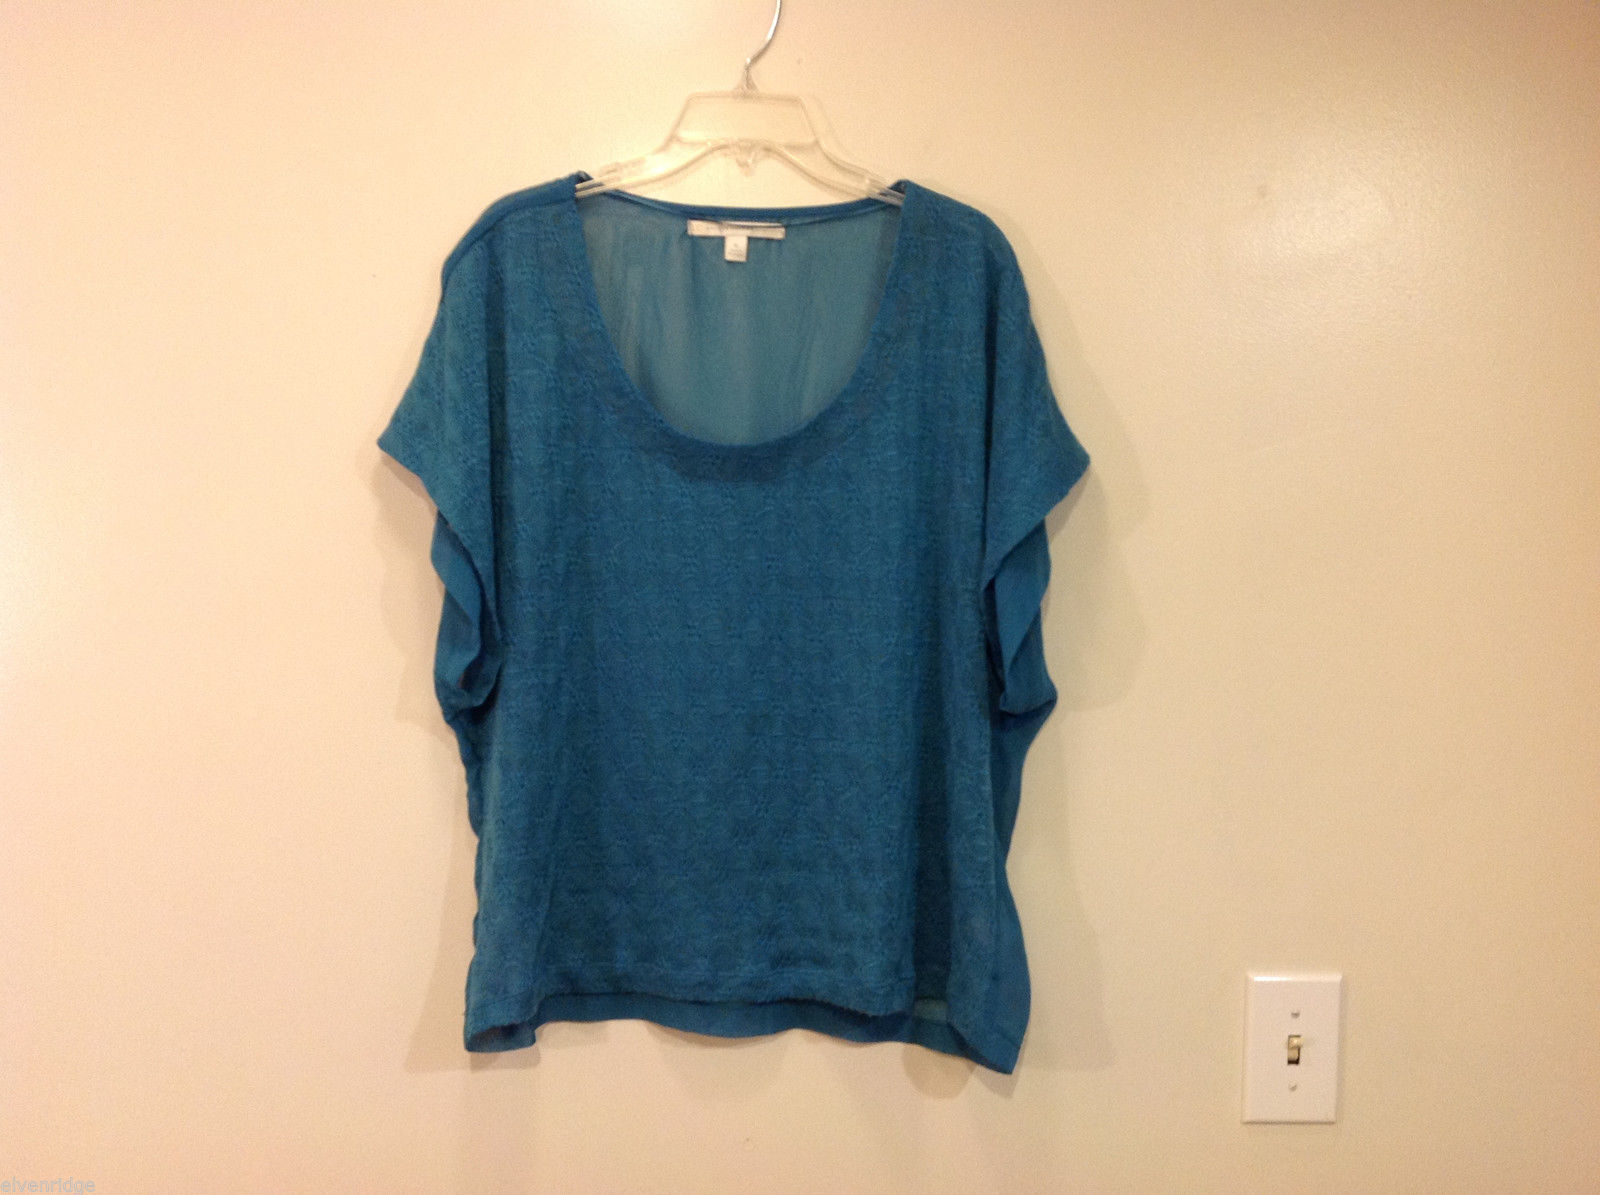 Lauren Conrad Soft Turquoise Ladies Blouse Top, Size XL 100% polyester